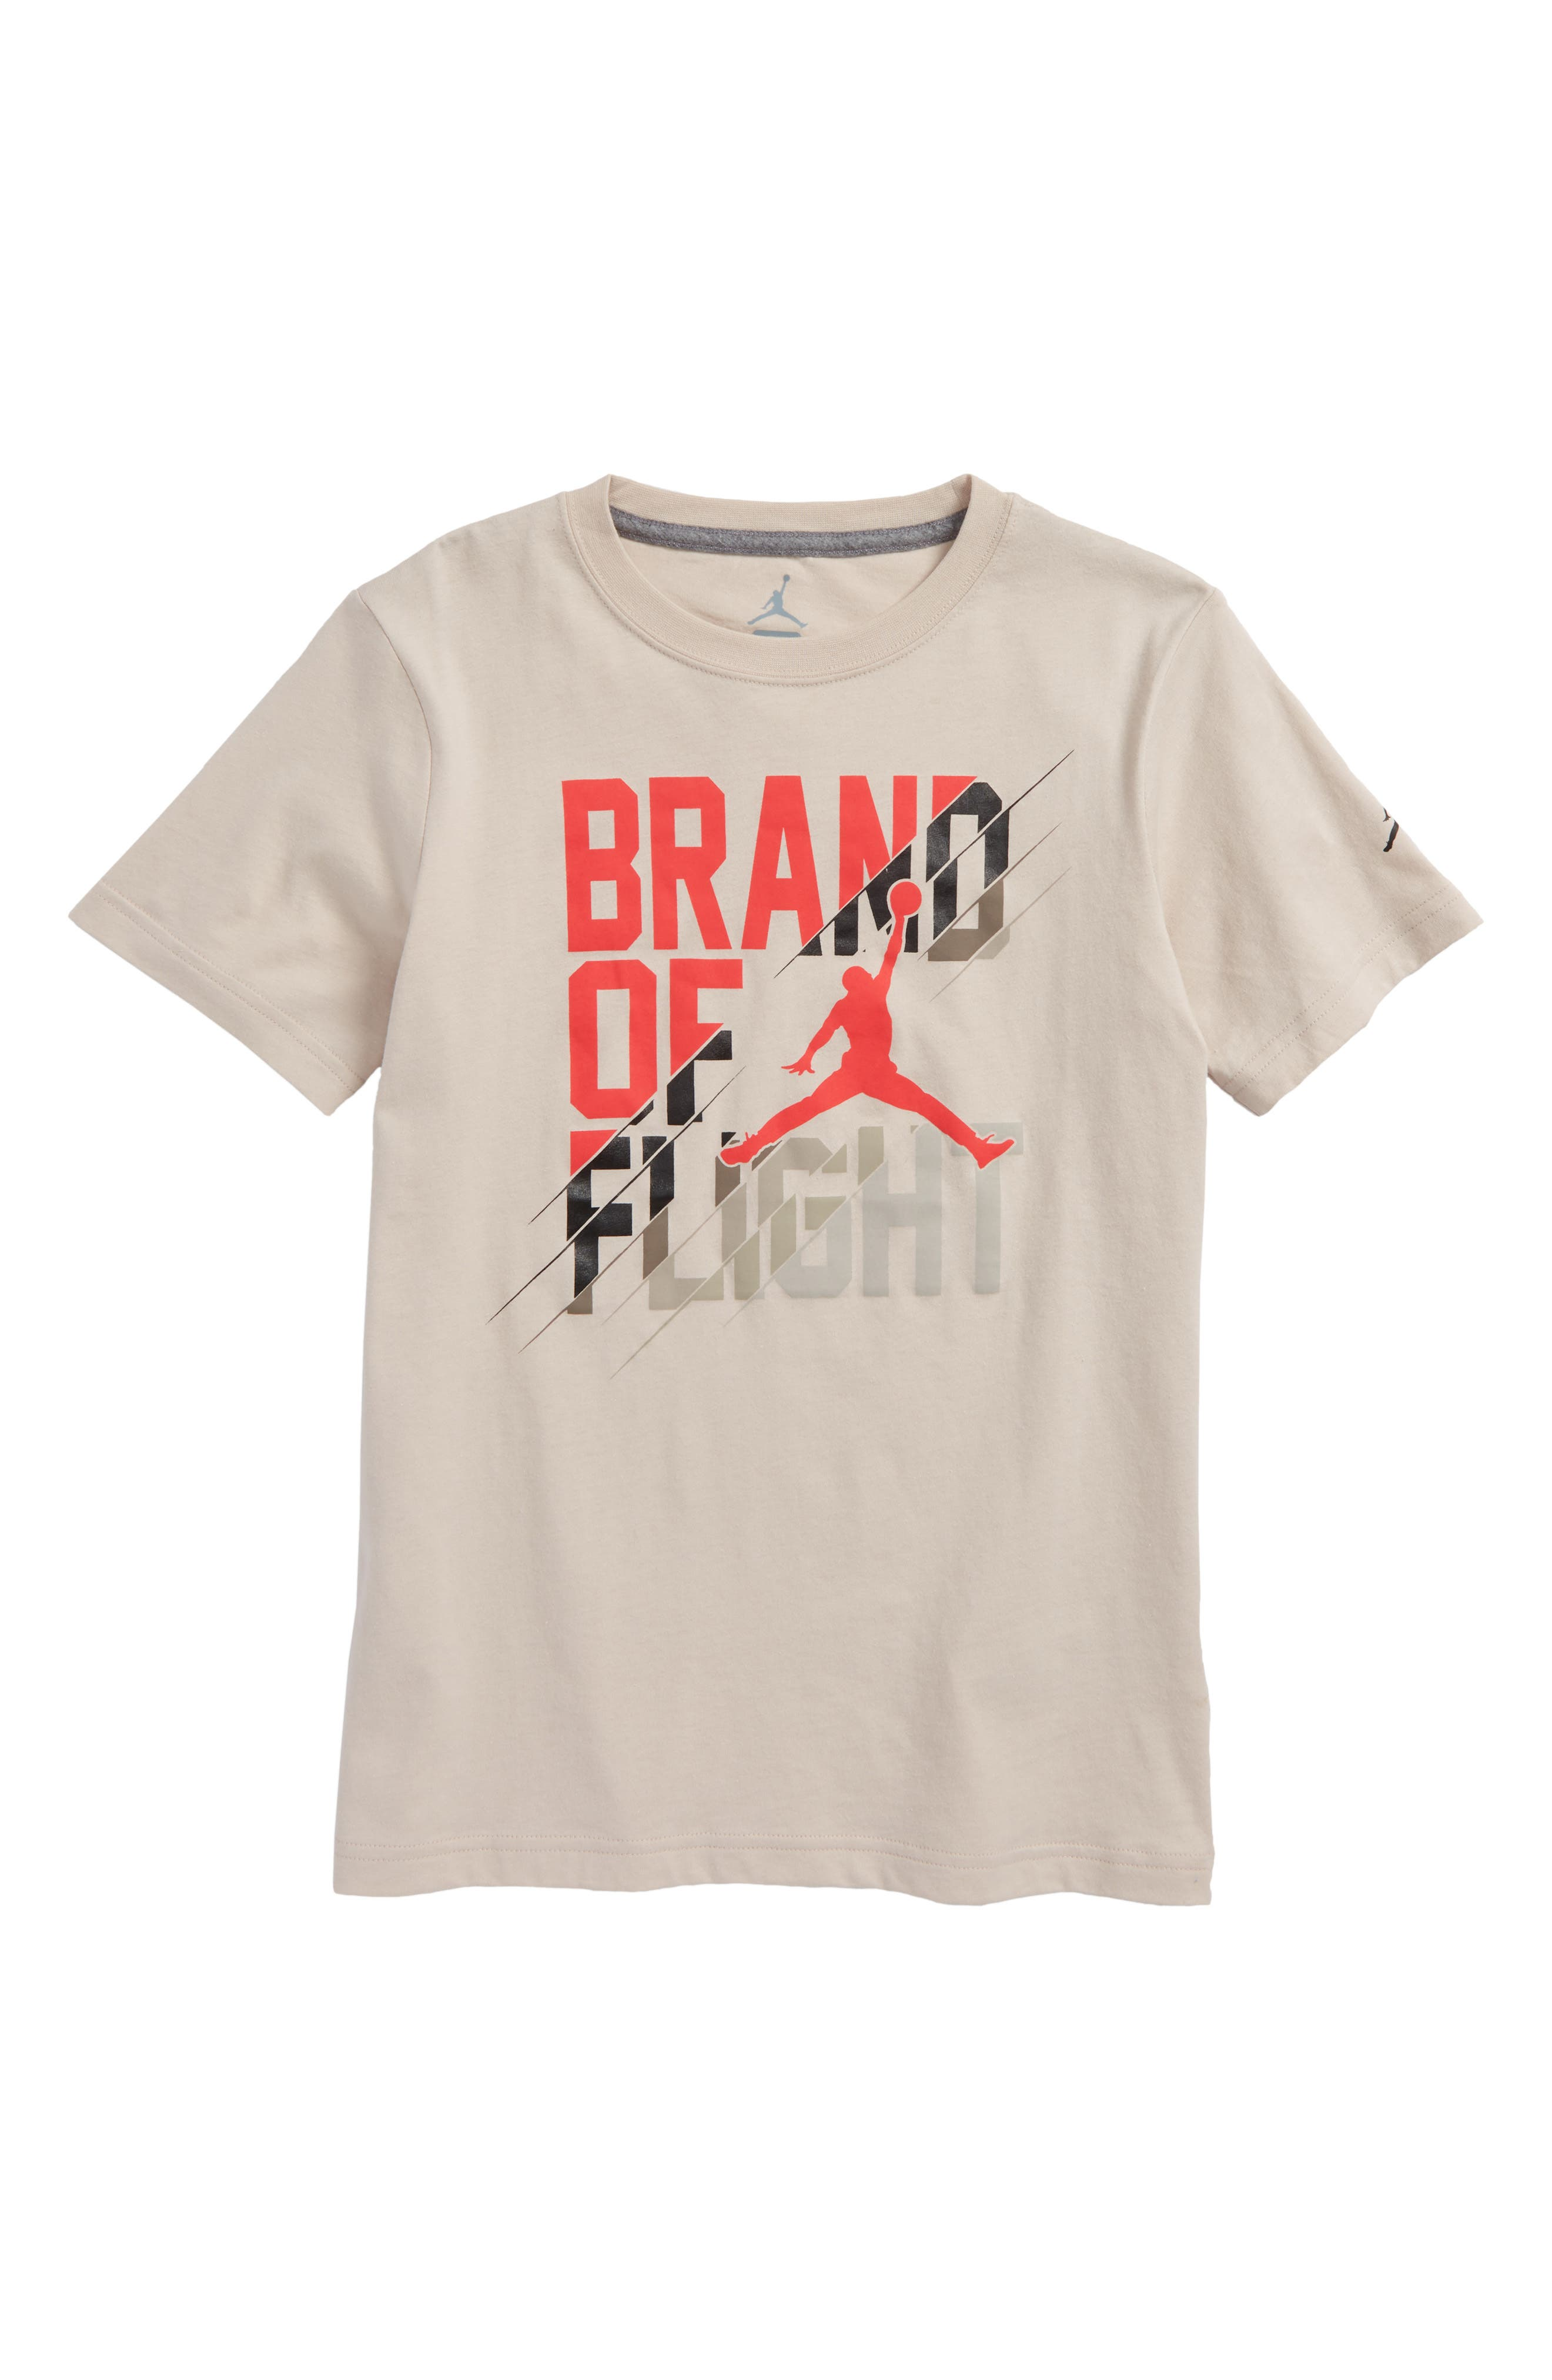 Jurdan Cut To The Rim Graphic T-Shirt (Big Boys)